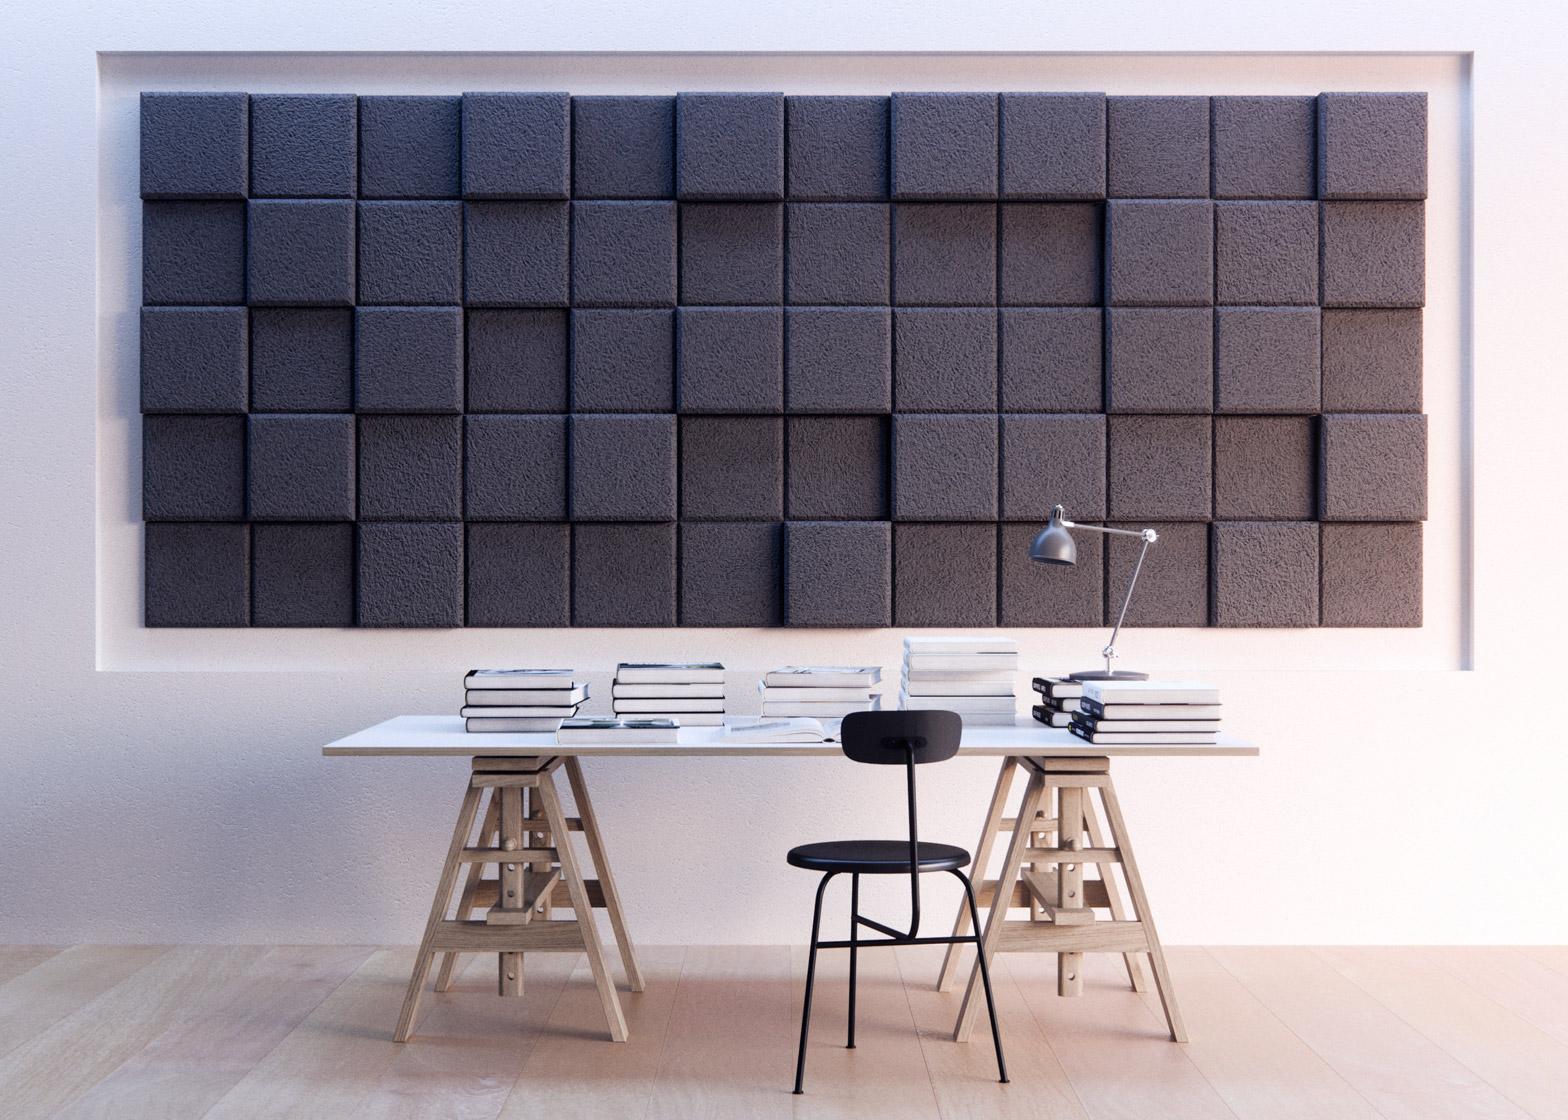 Acoustic Tiles Form Us With Love Pixellated Baux dezeen 1568 3